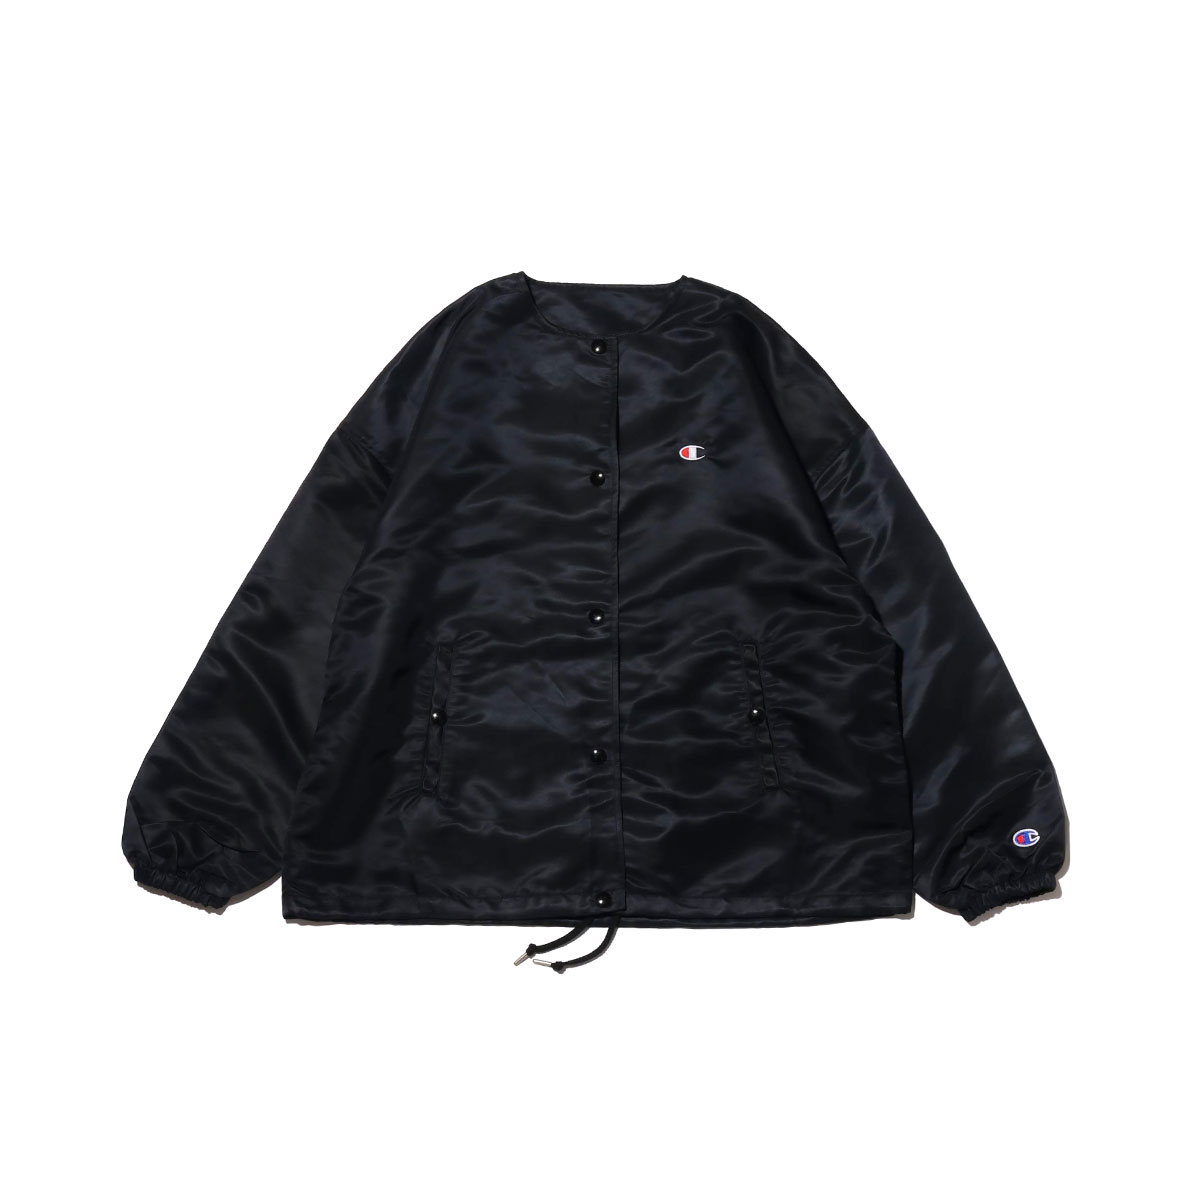 Champion SATIN JACKET (チャンピオン サテン ジャケット)ブラック【レディース ジャケット】19SP-I